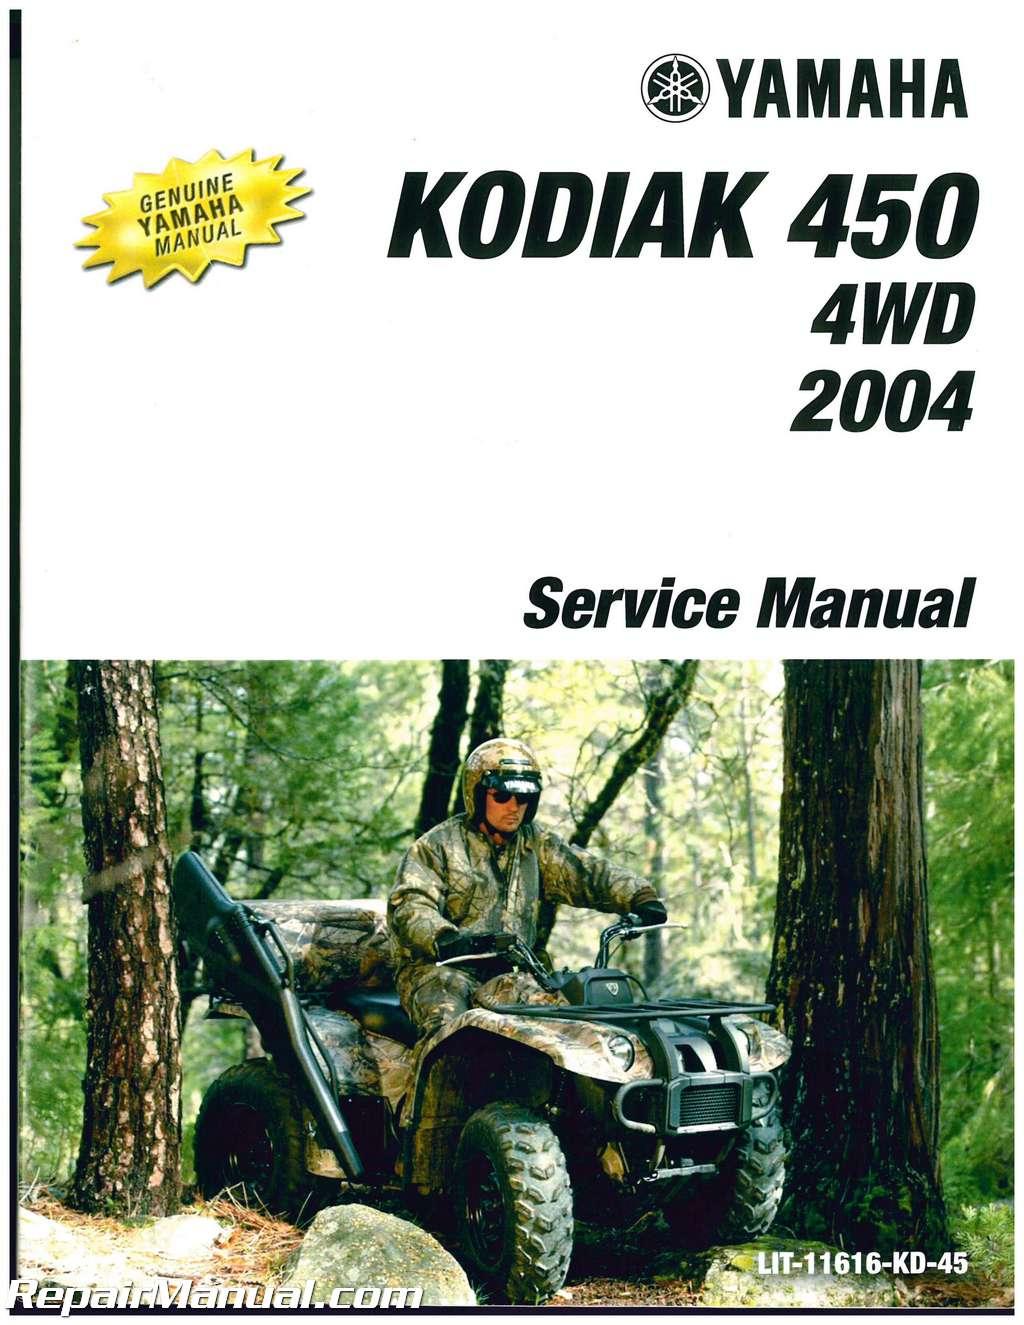 2004 yamaha kodiak 450 service manual